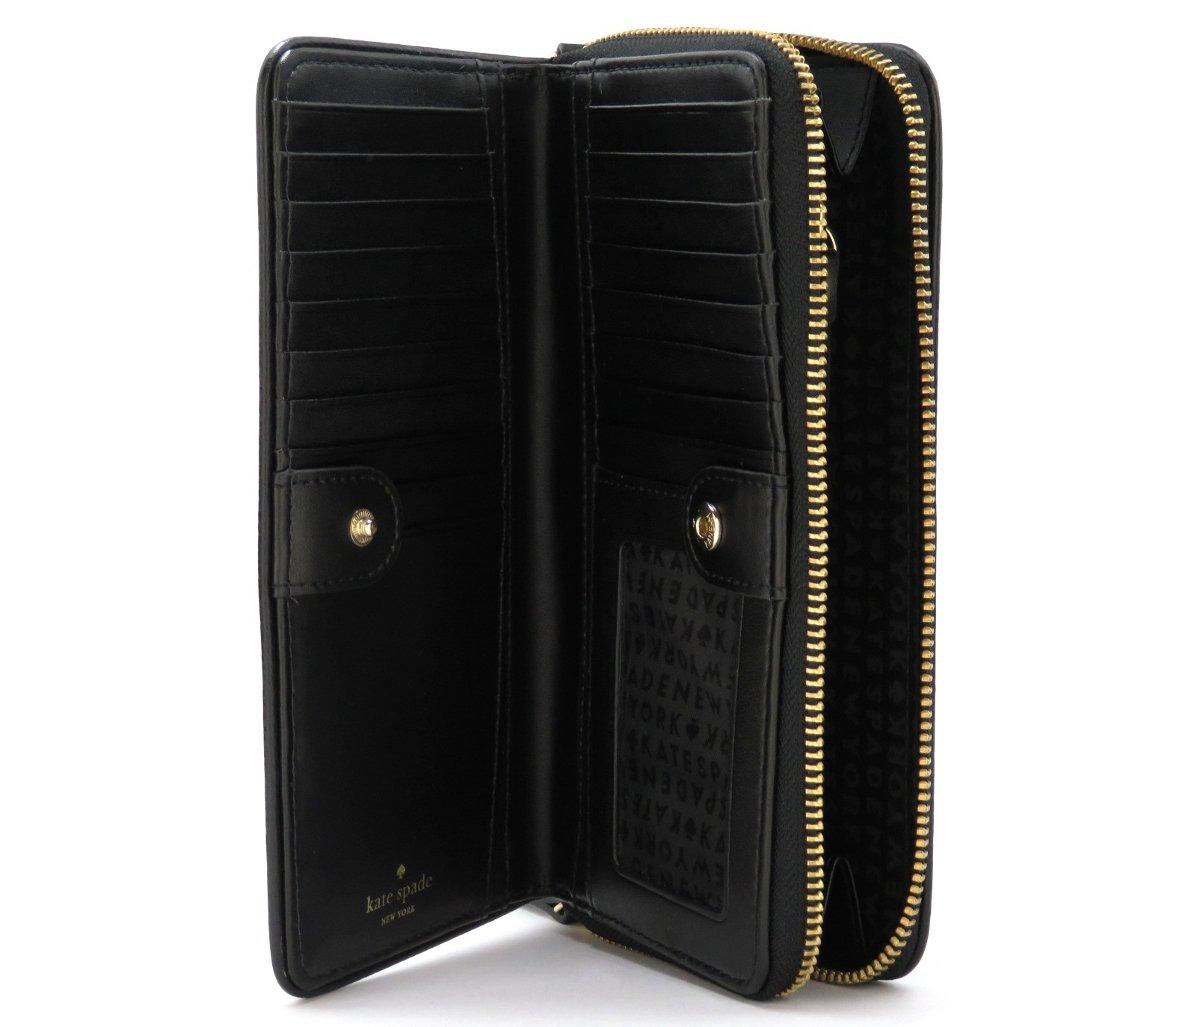 Kate Spade New York Mulberry Street Brigitta Wristlet Wallet Handbag (Black) by Kate Spade New York (Image #5)